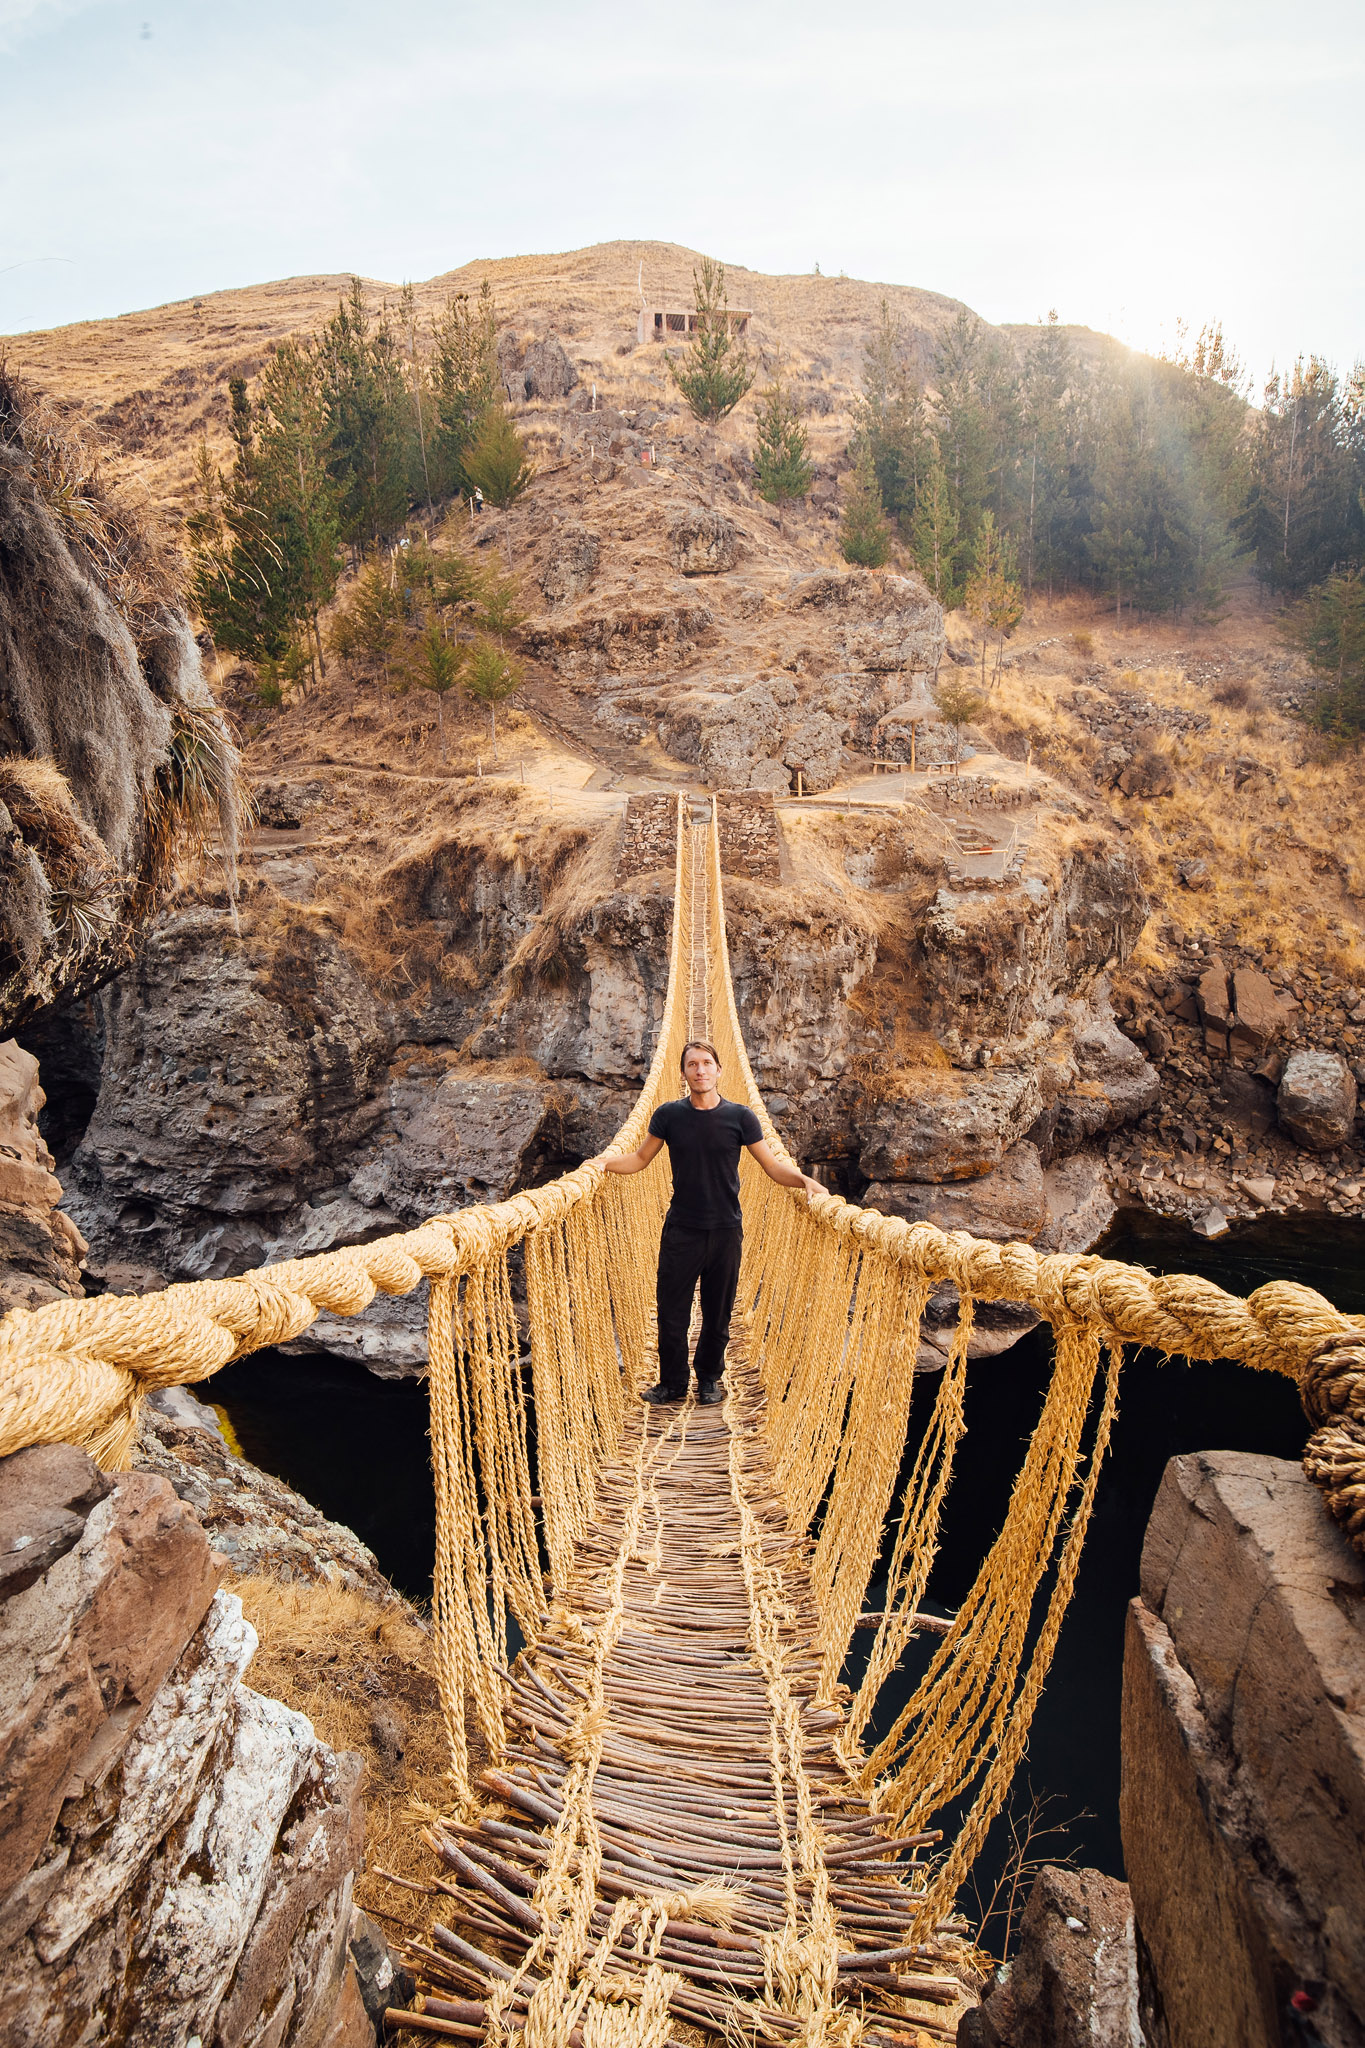 travel-photography-overlanding-apurimac-valley-peru-queswachaka-last-inca-bridge-12.jpg